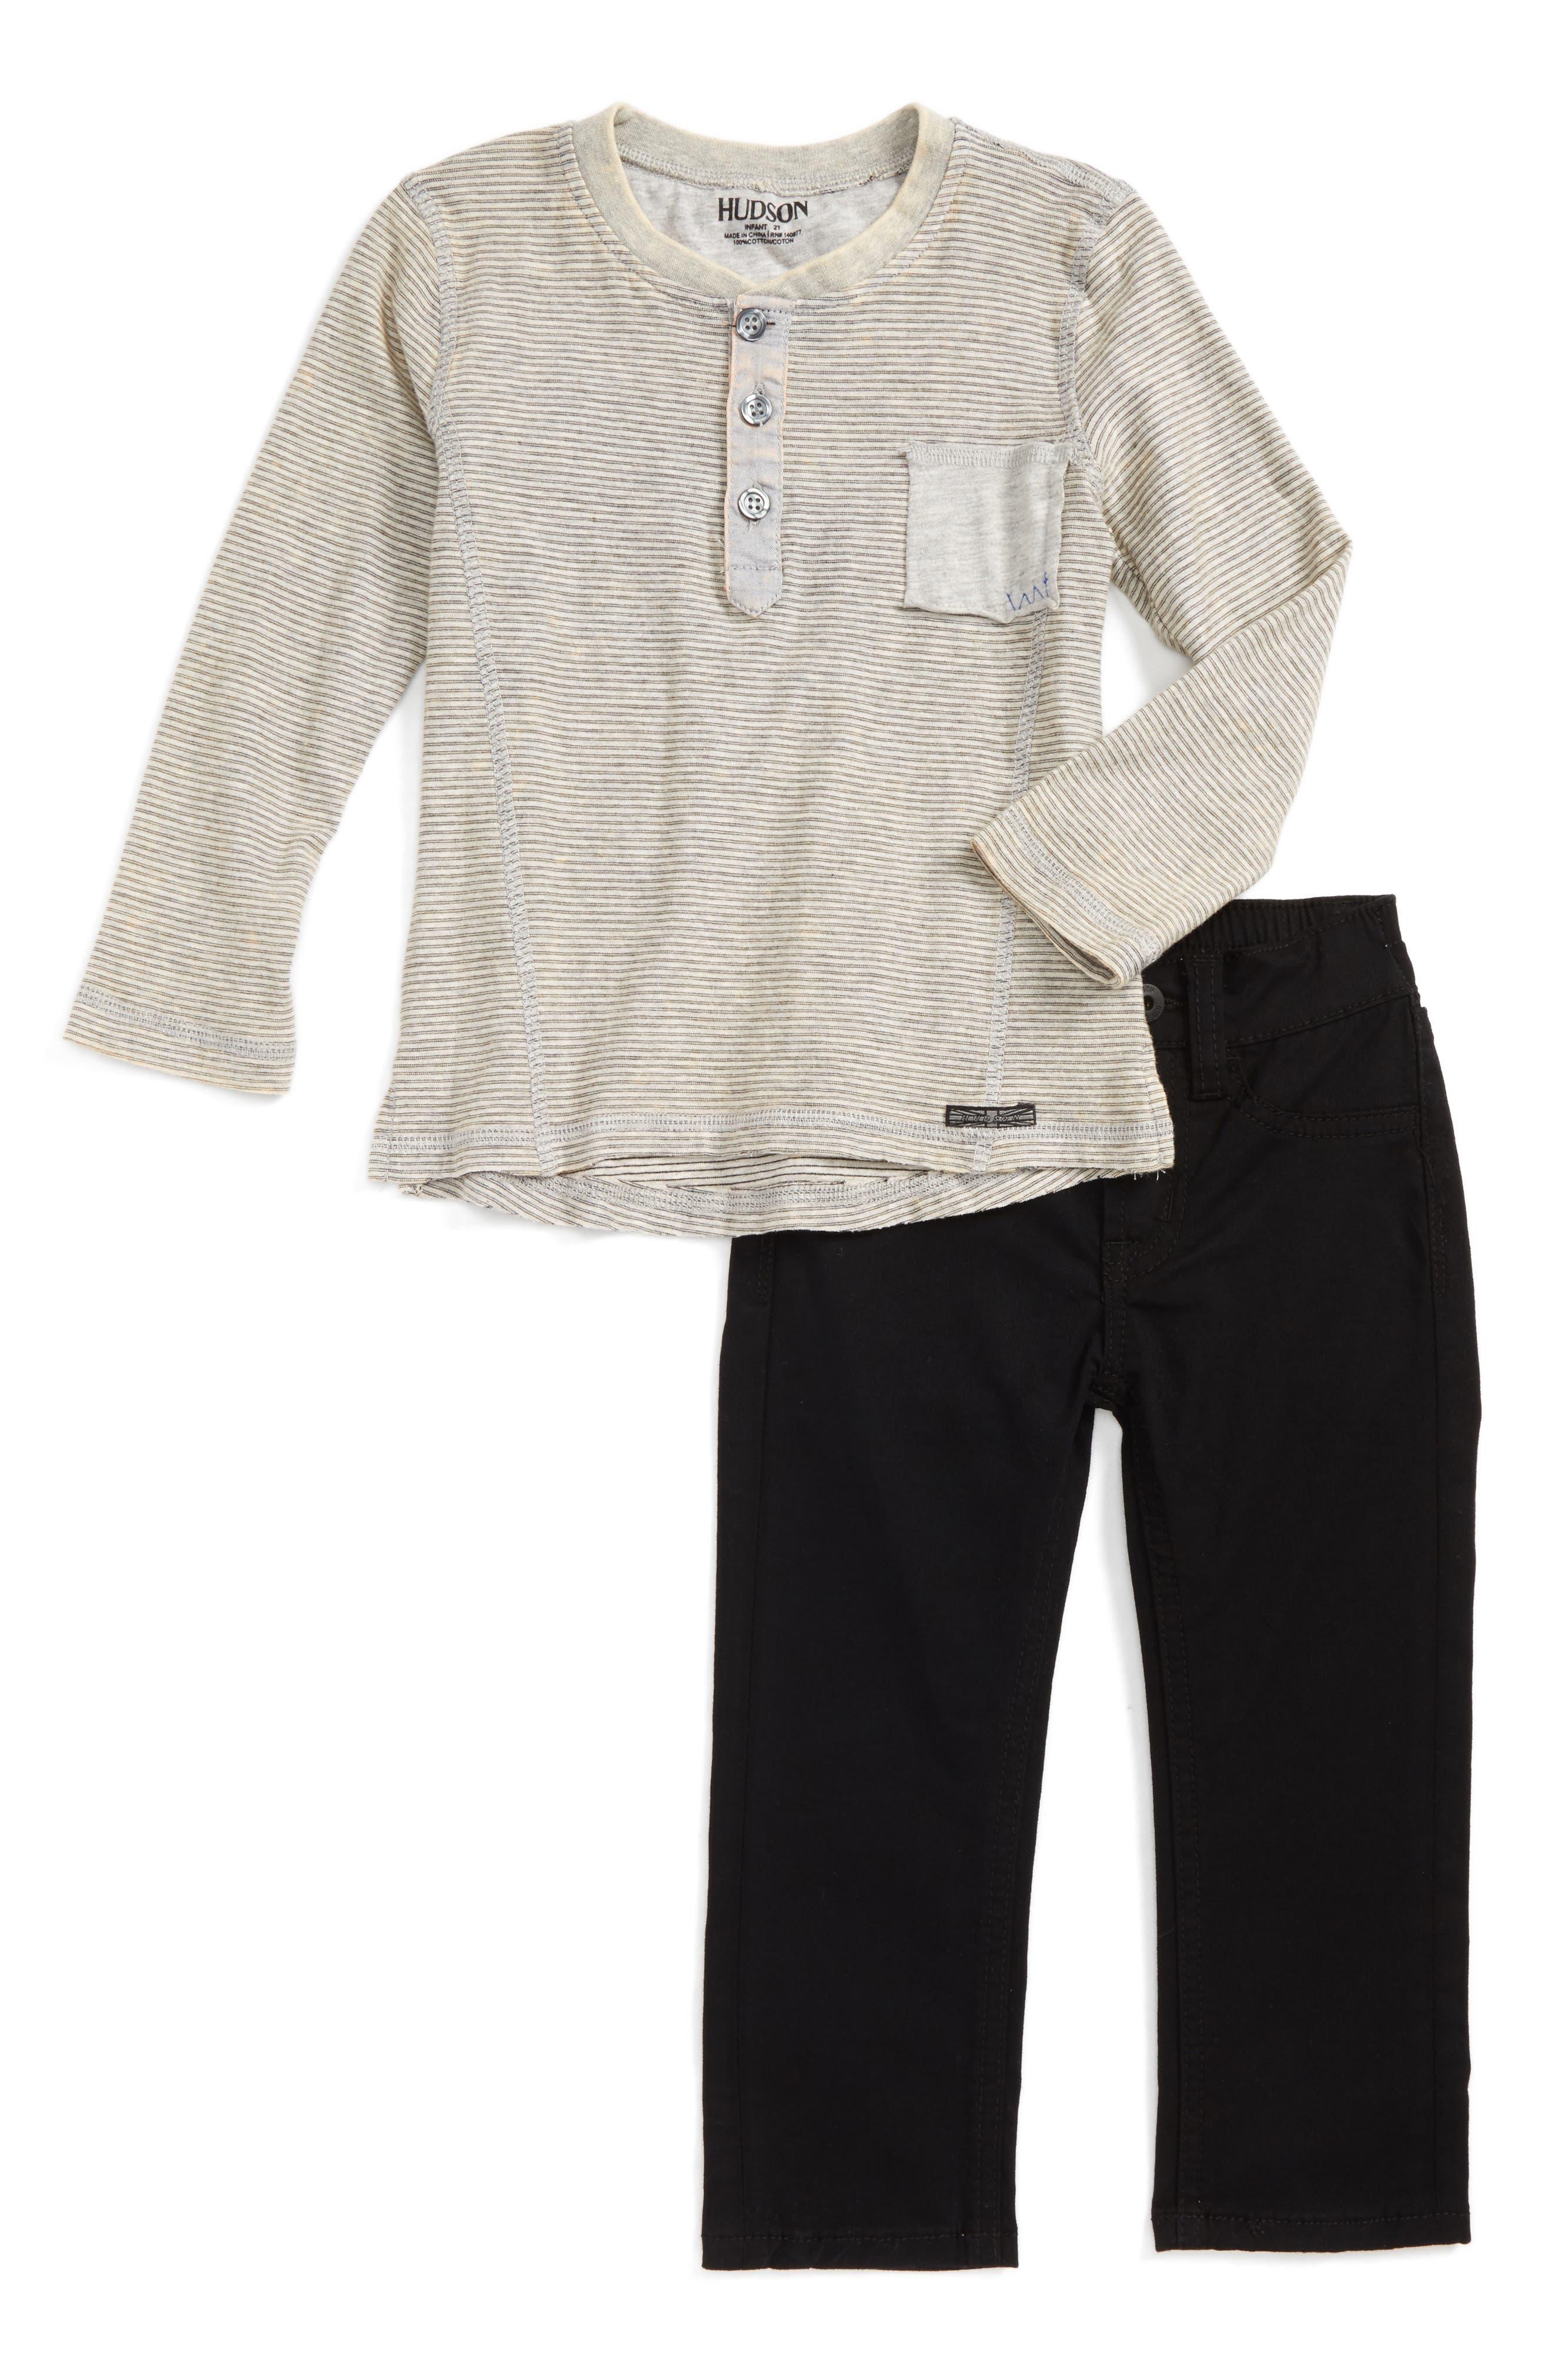 Main Image - Hudson Stripe Henley & Jeans Set (Toddler Boys)